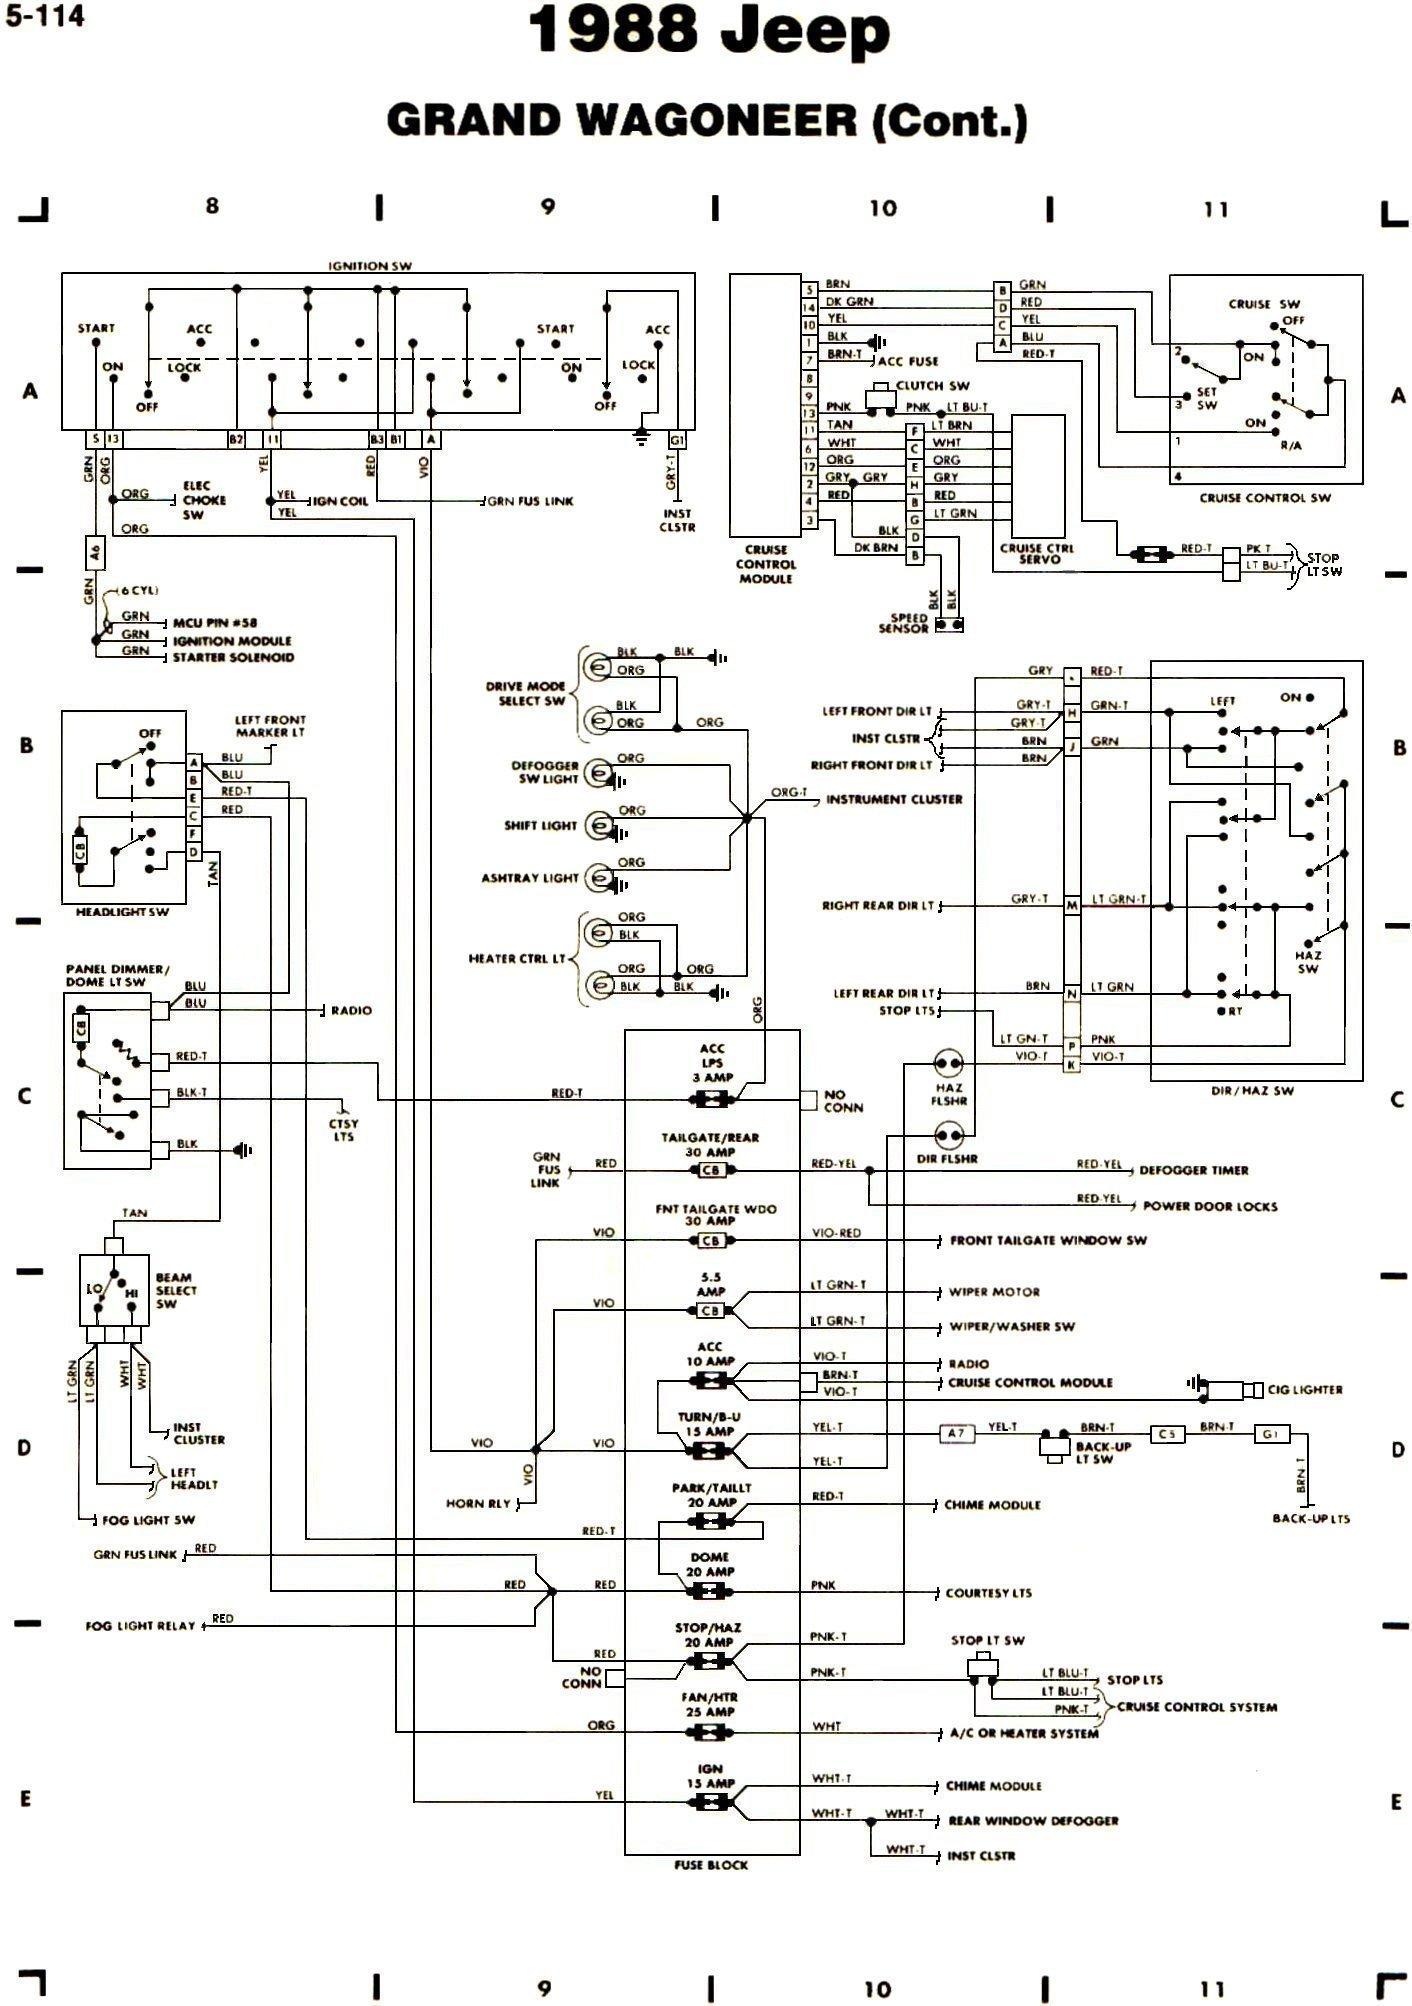 1997 freightliner fl70 wiring diagrams best part of wiring diagram1997 freightliner wiring diagram 7k schwabenschamanen de \\u2022freightliner cruise control wiring diagram wiring library rh